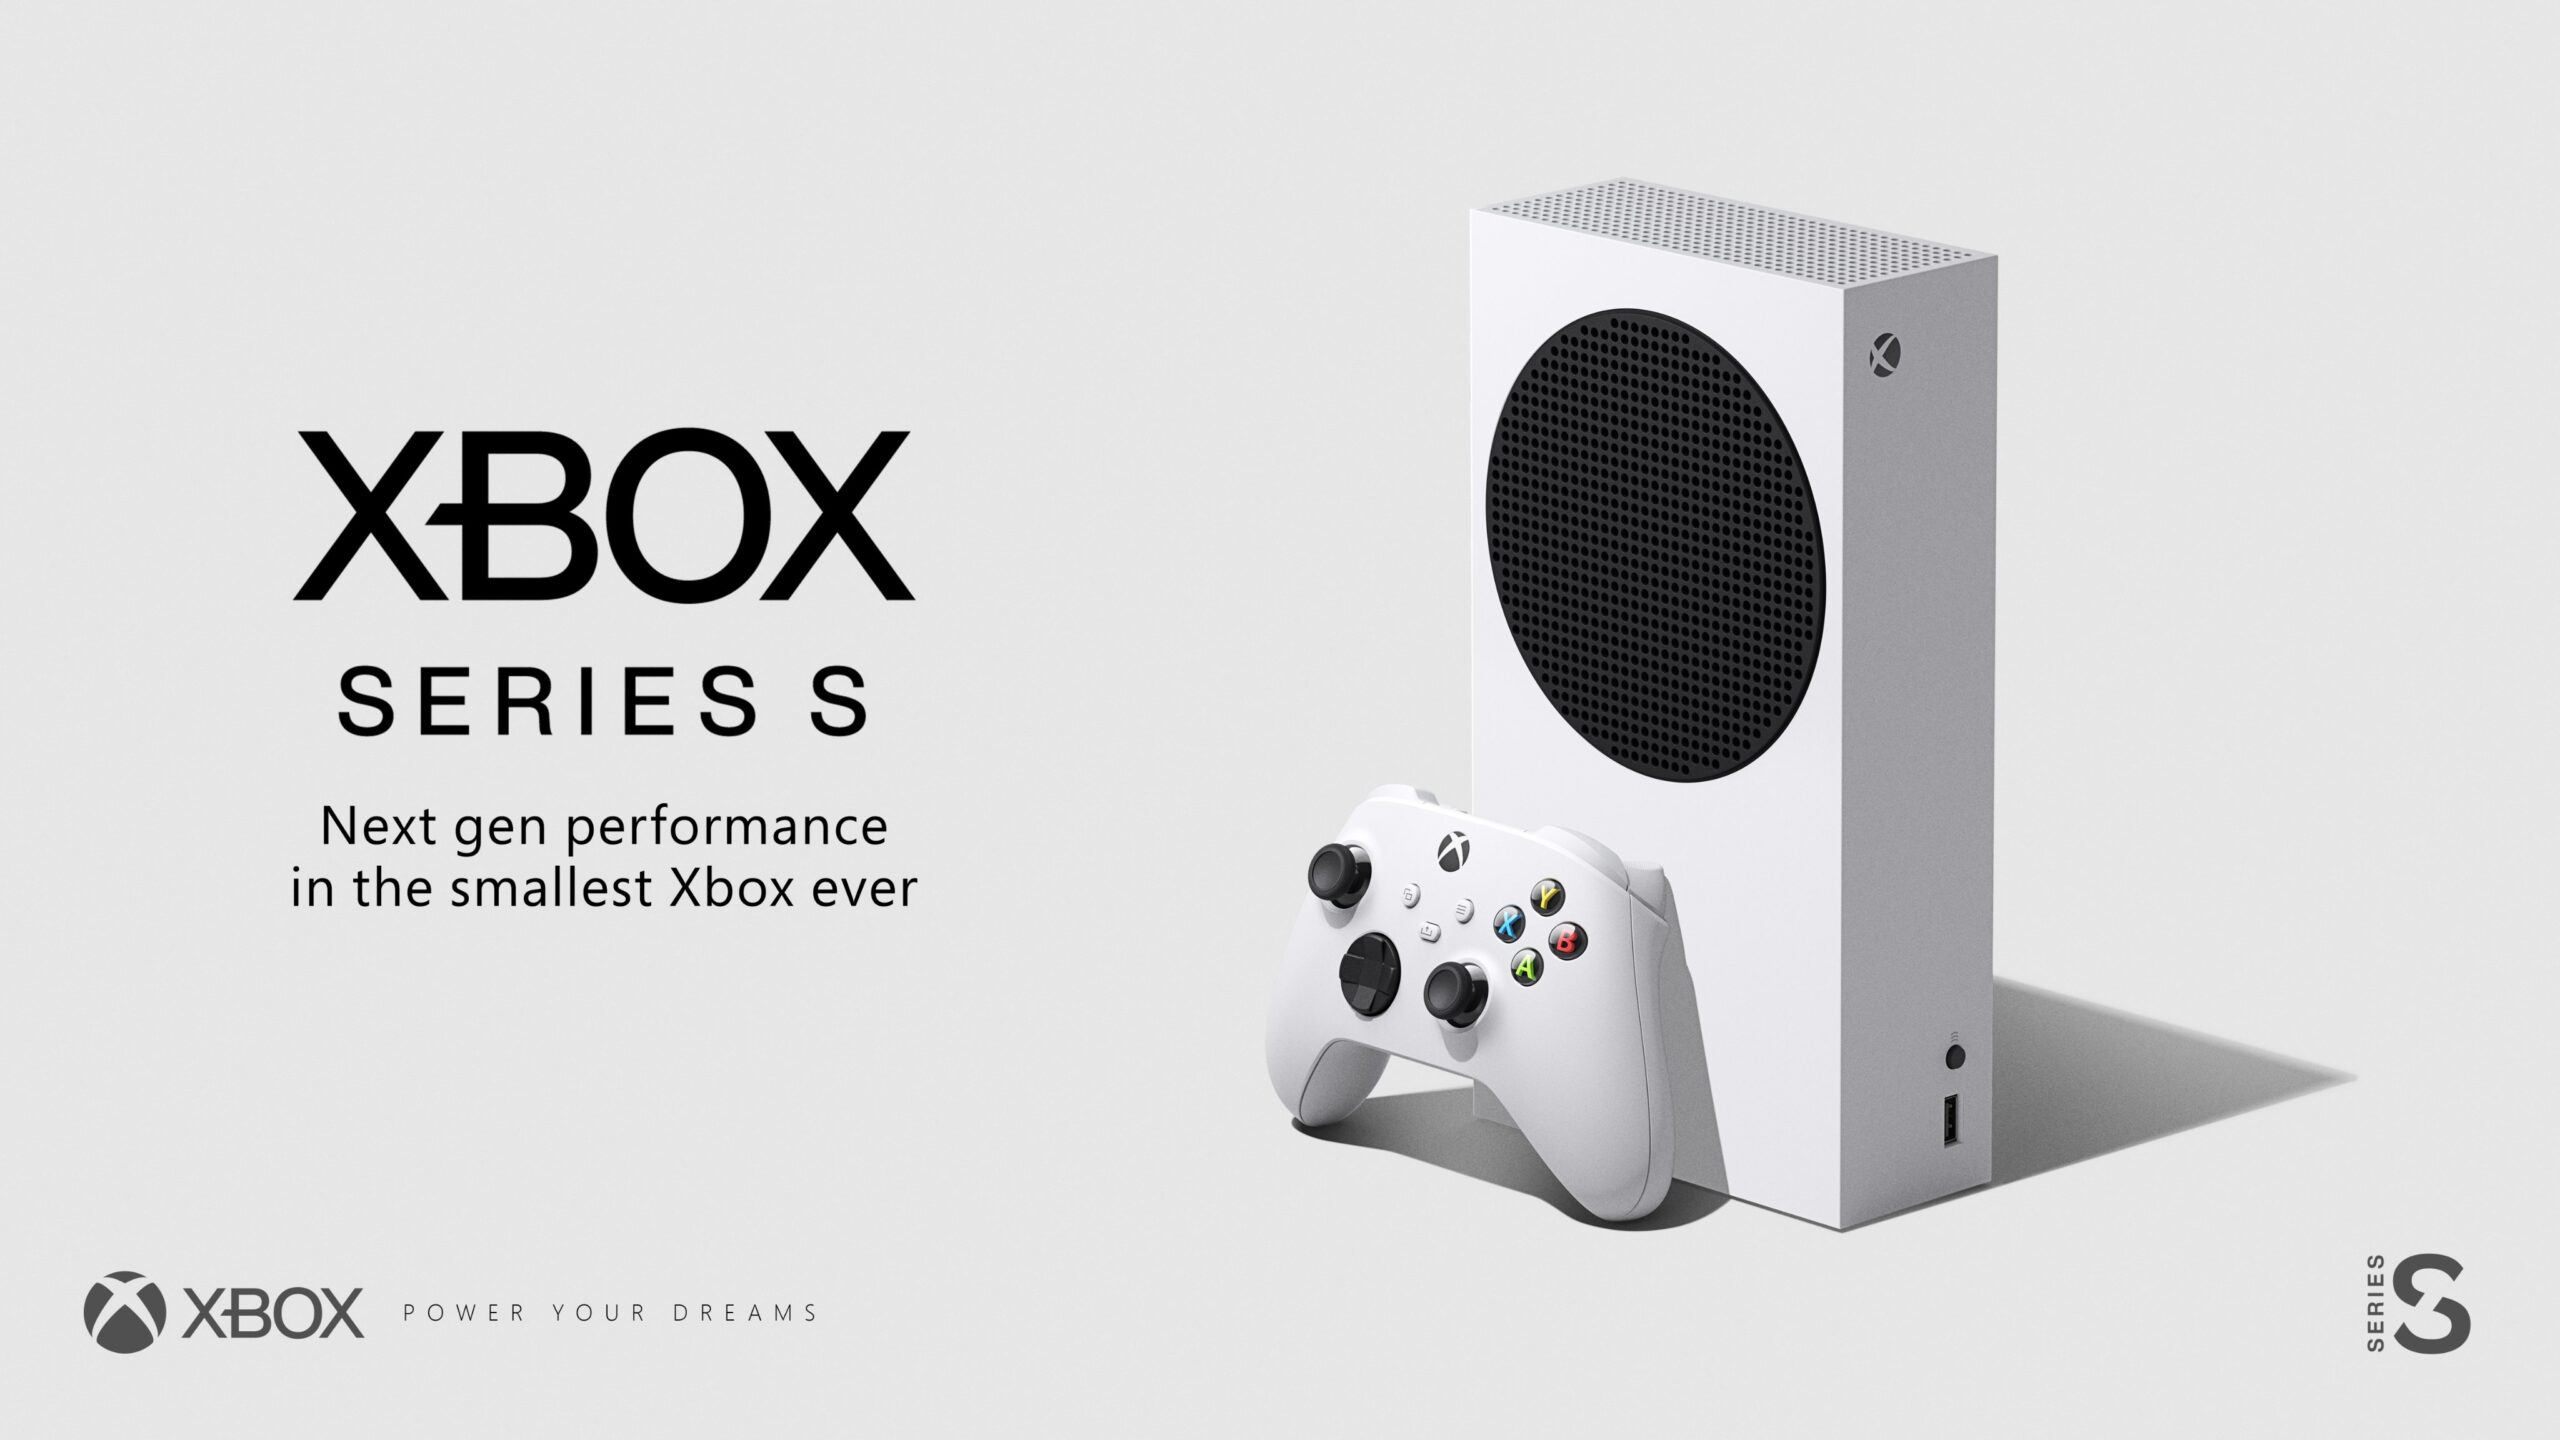 Раскрыты цены и дата выхода Xbox Series X и Xbox Series S